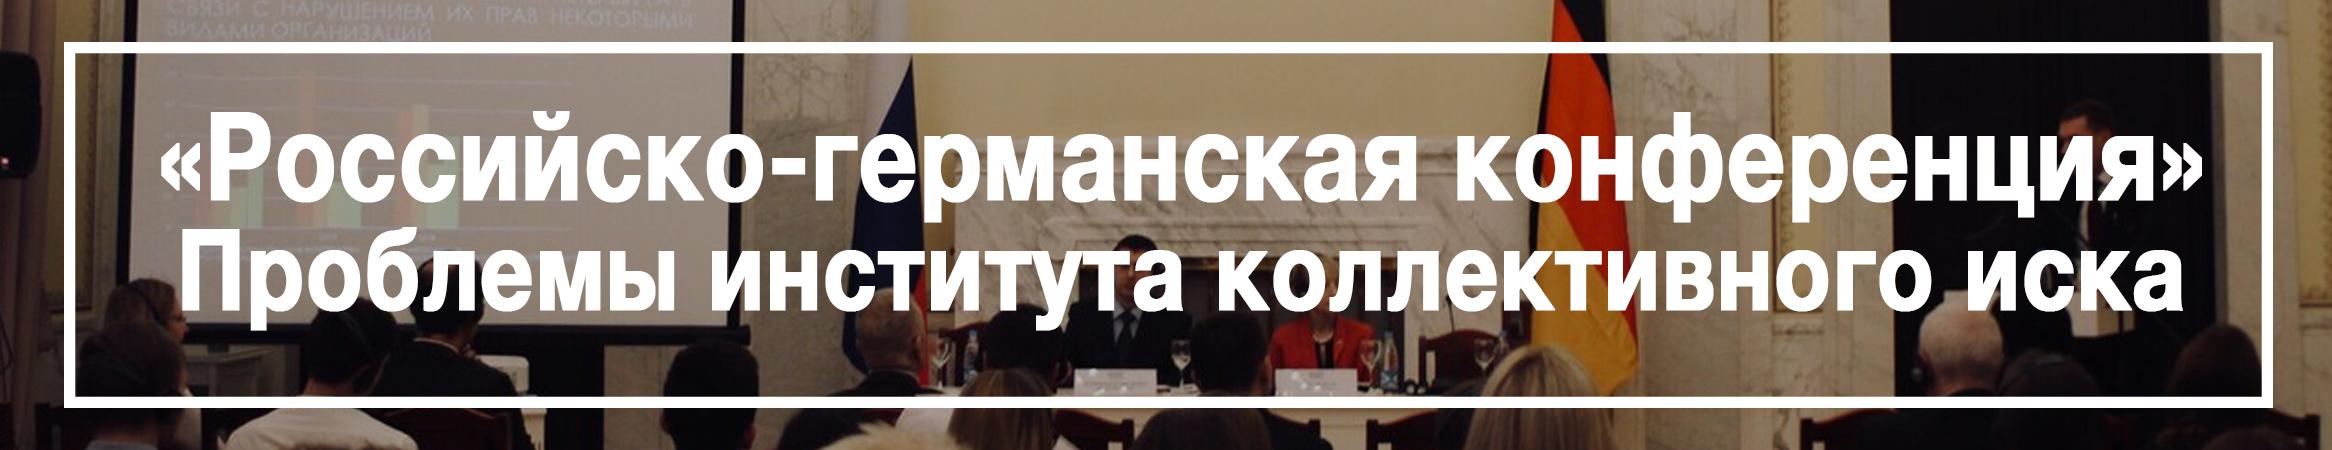 la-advokat.ru/about/